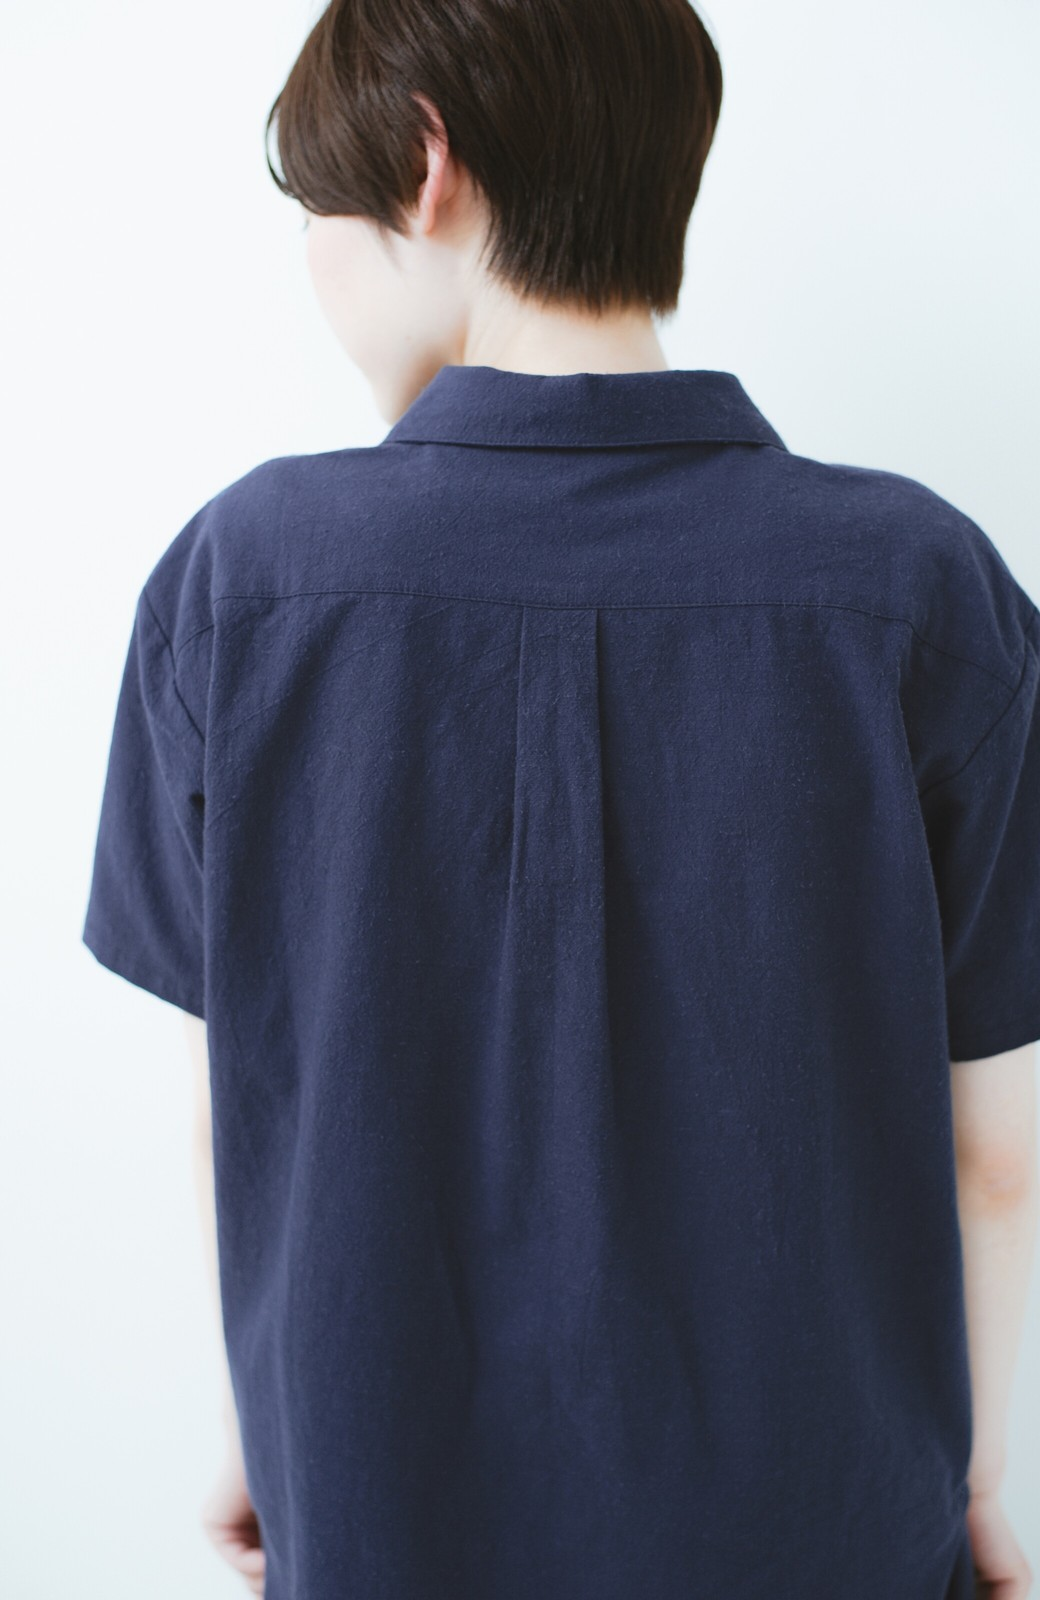 haco! PBP オーガニックコットン 母モコトの上下別々で普段も着られる 綿麻パジャマ <ネイビー>の商品写真5